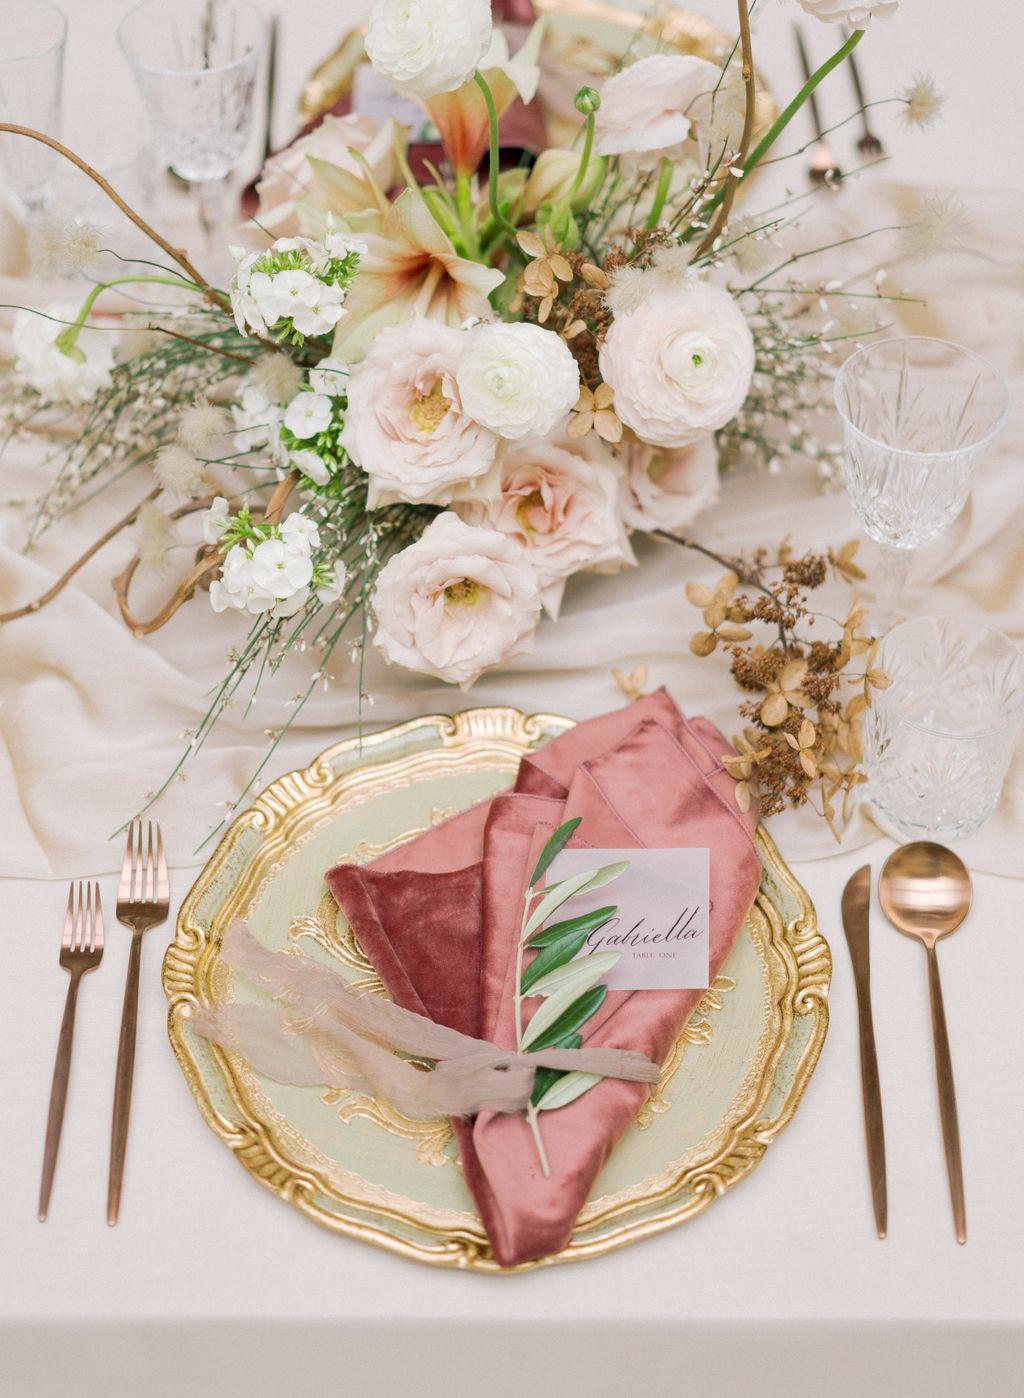 artiese-ago-wedding-editorial-06623.jpg